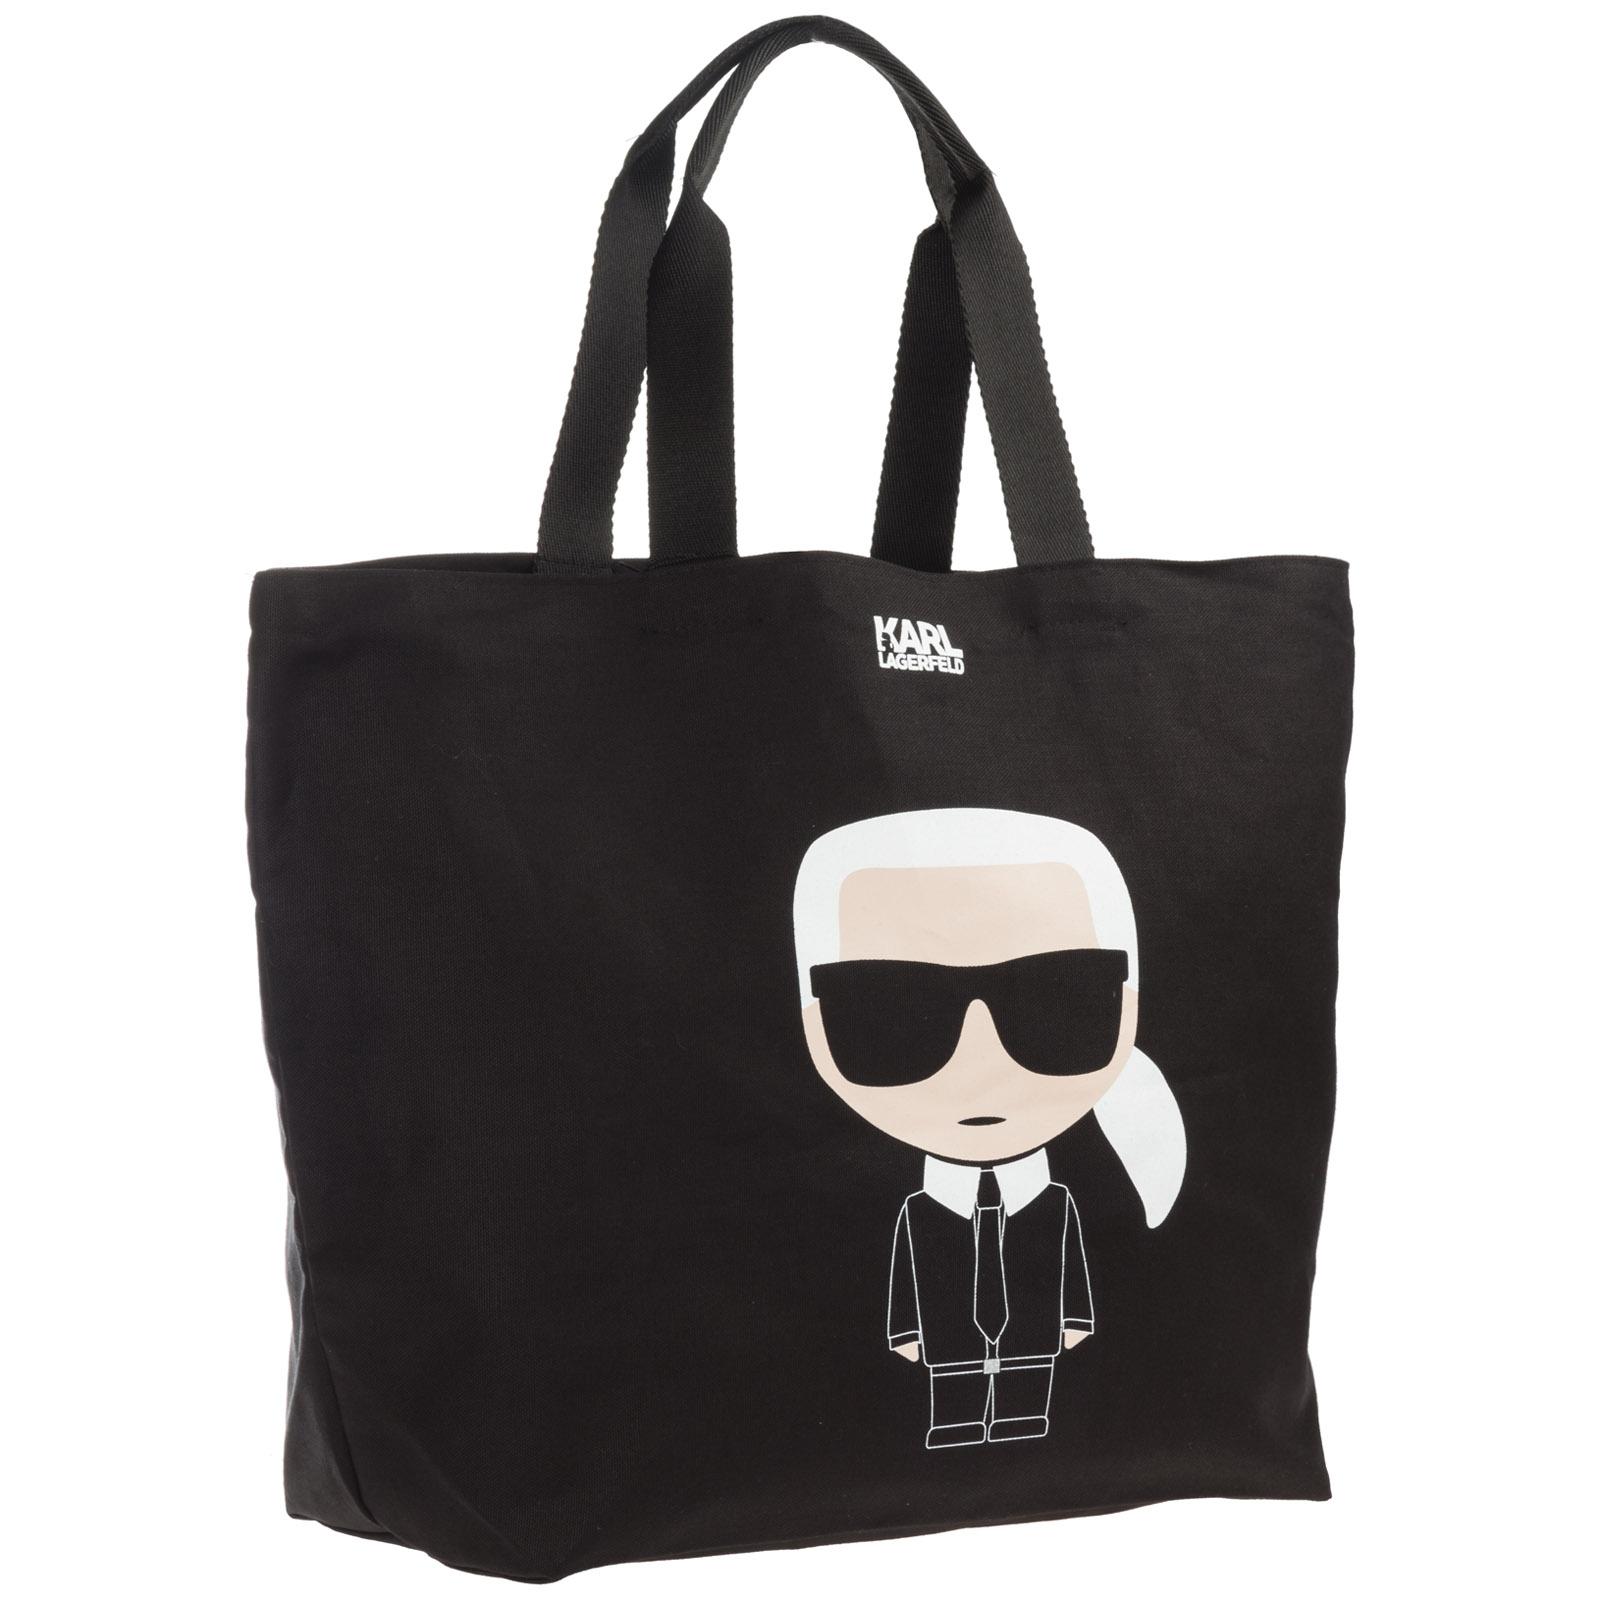 Women's handbag shopping bag purse tote k/ikonik